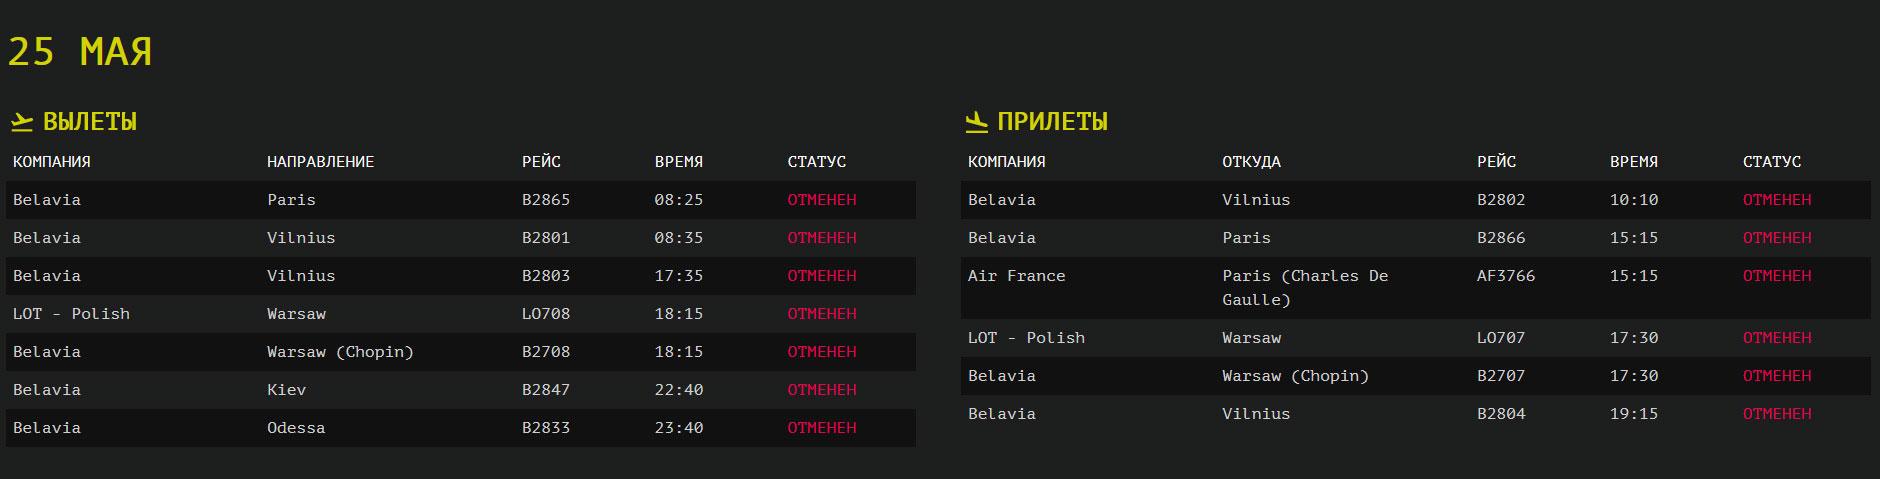 Беларусь - бесполетная зона10